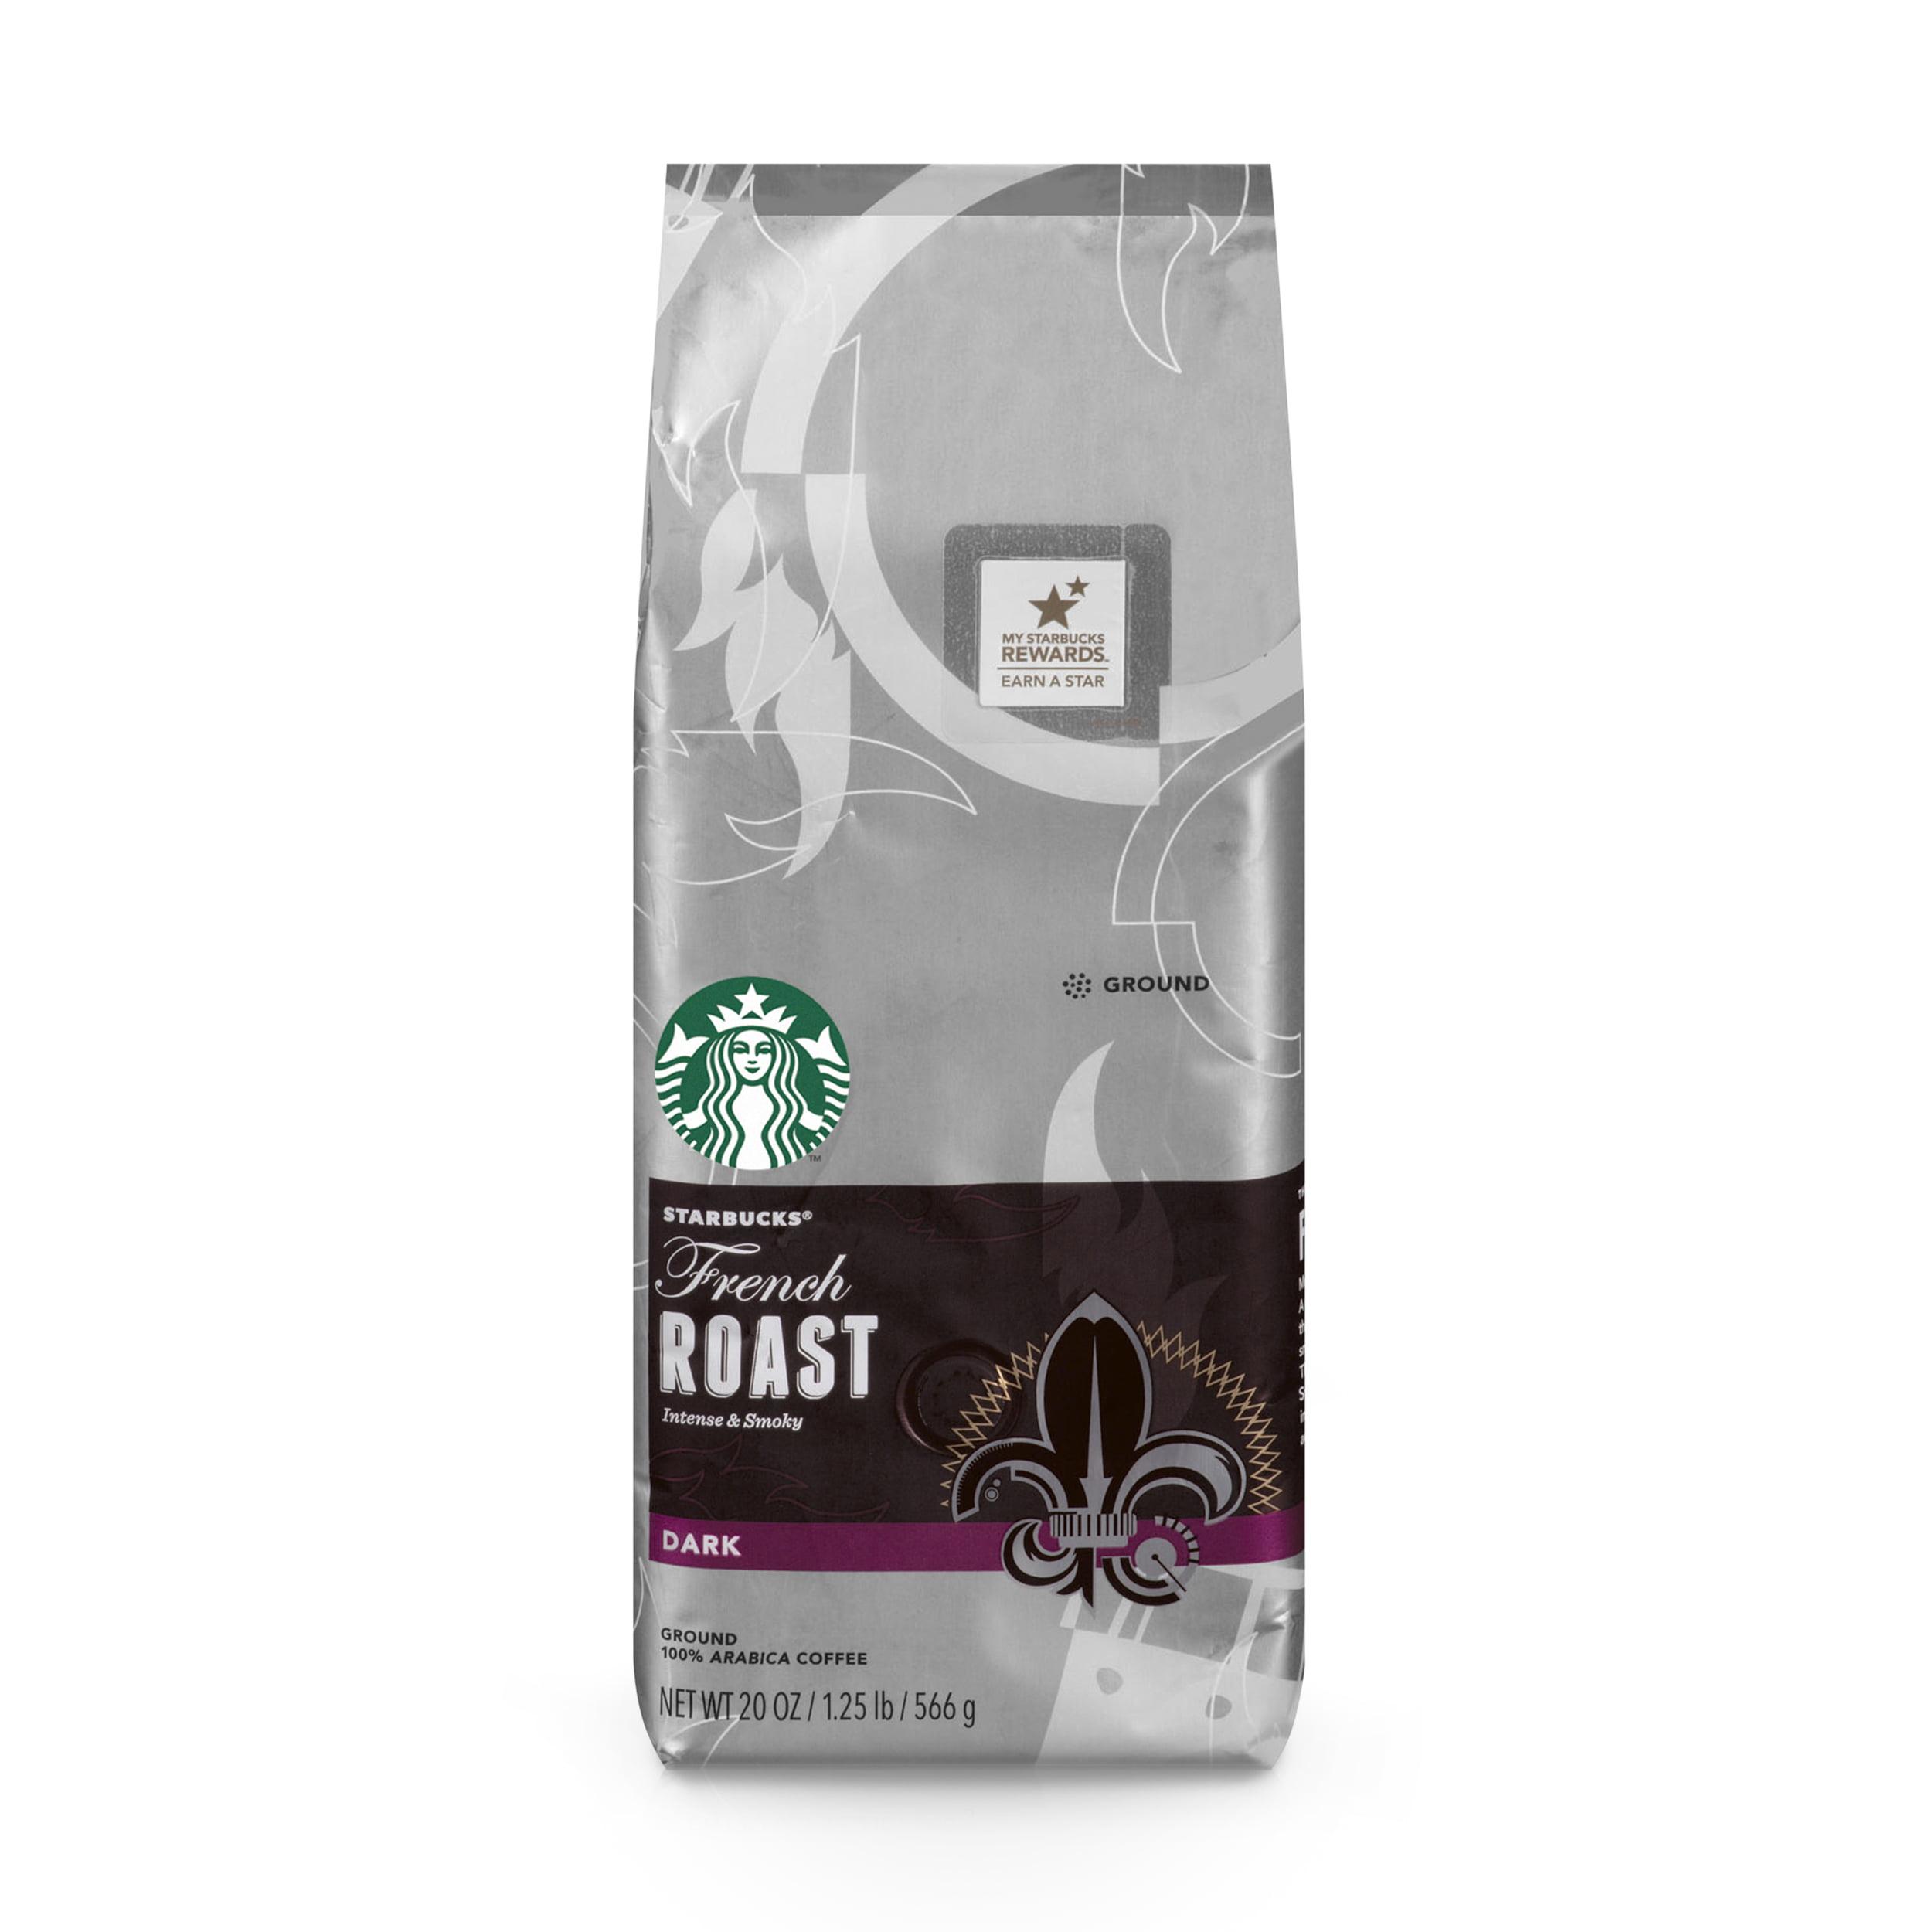 Starbucks French Roast Dark Roast Ground Coffee, 20-Ounce Bag ...